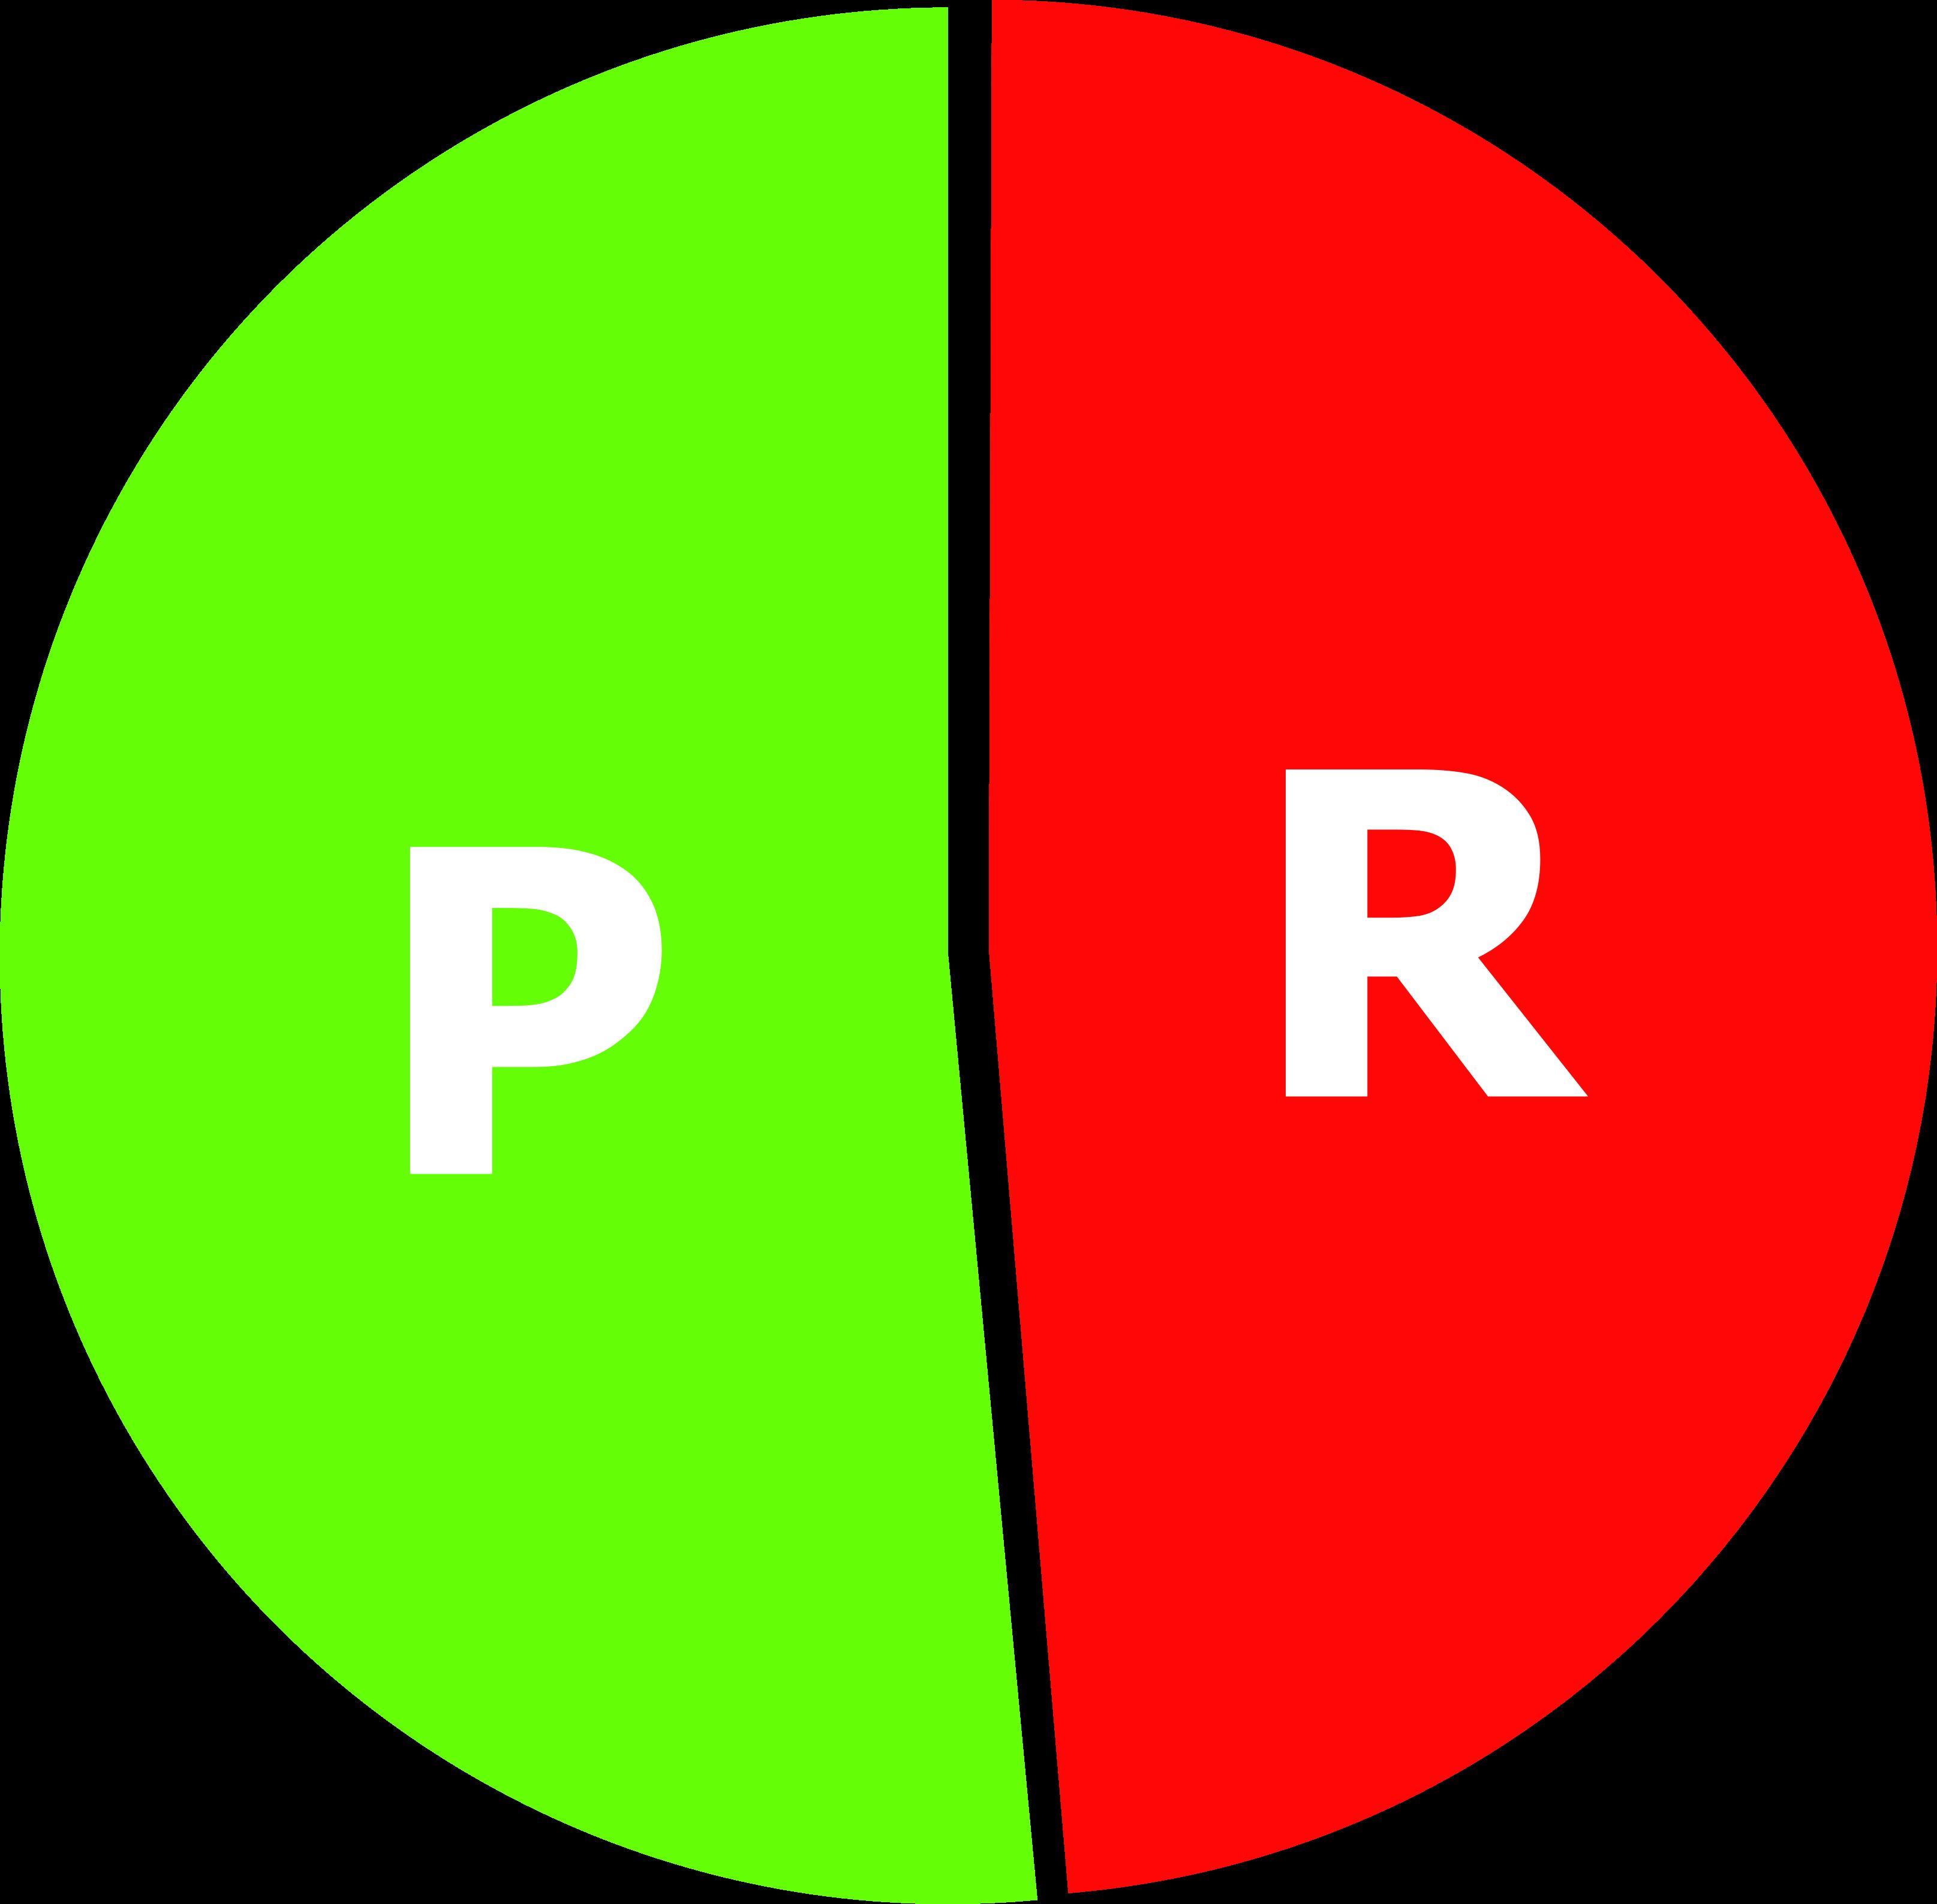 pie chart progressive and democrat